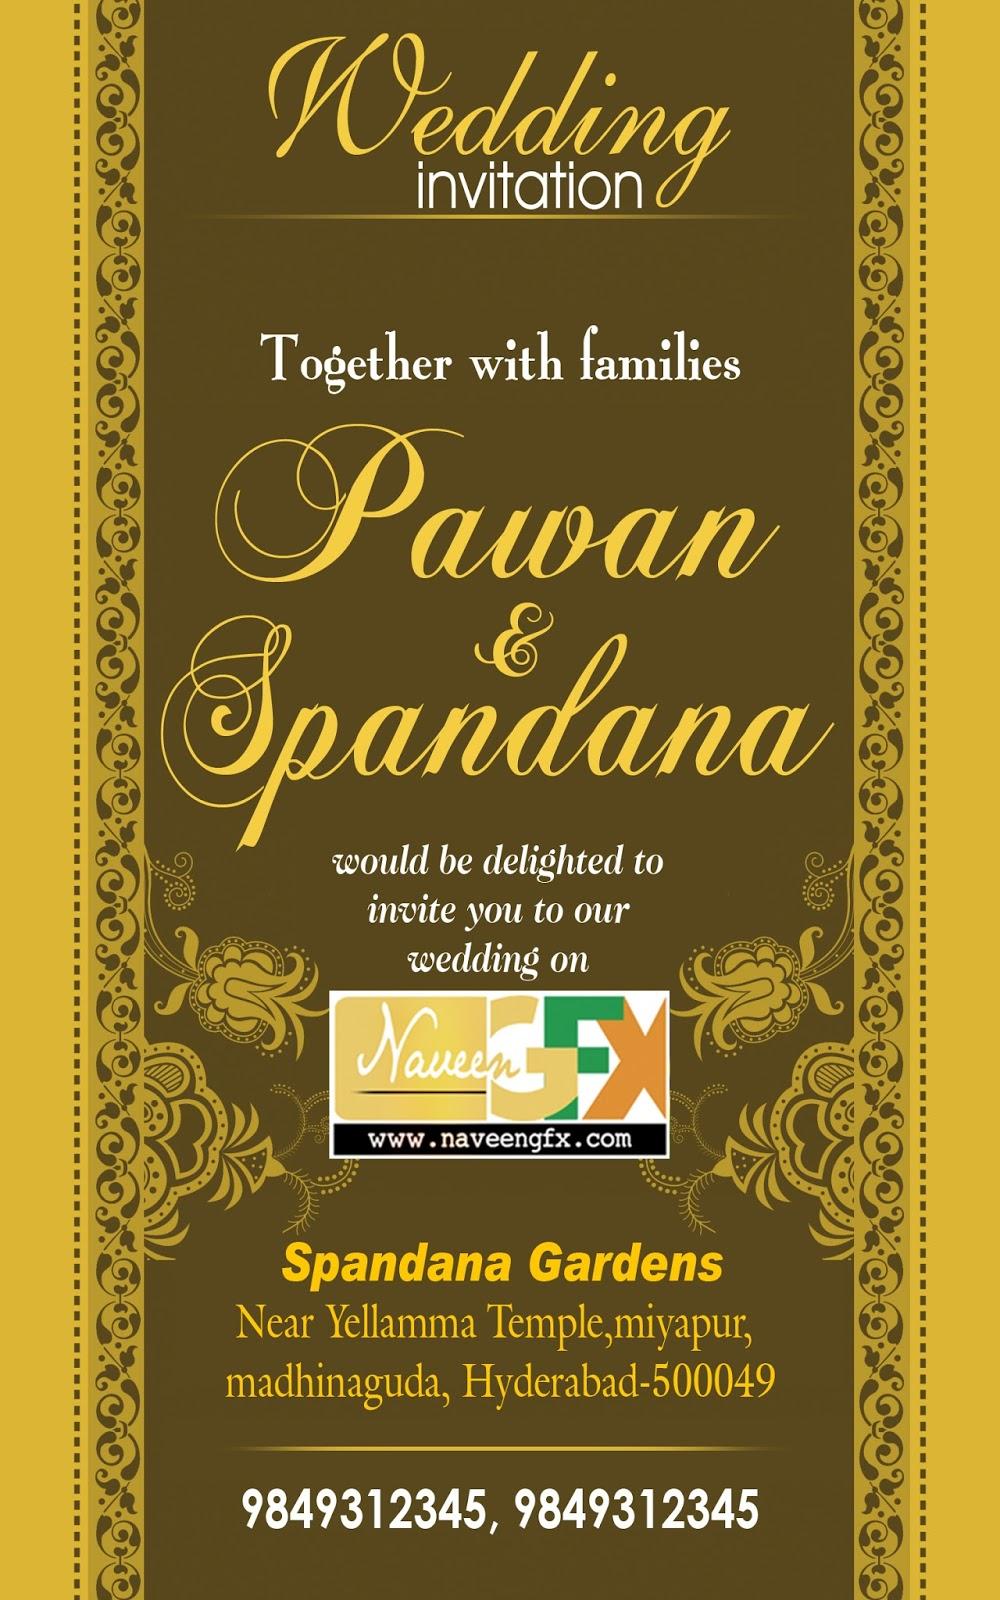 personal wedding invitation card psd